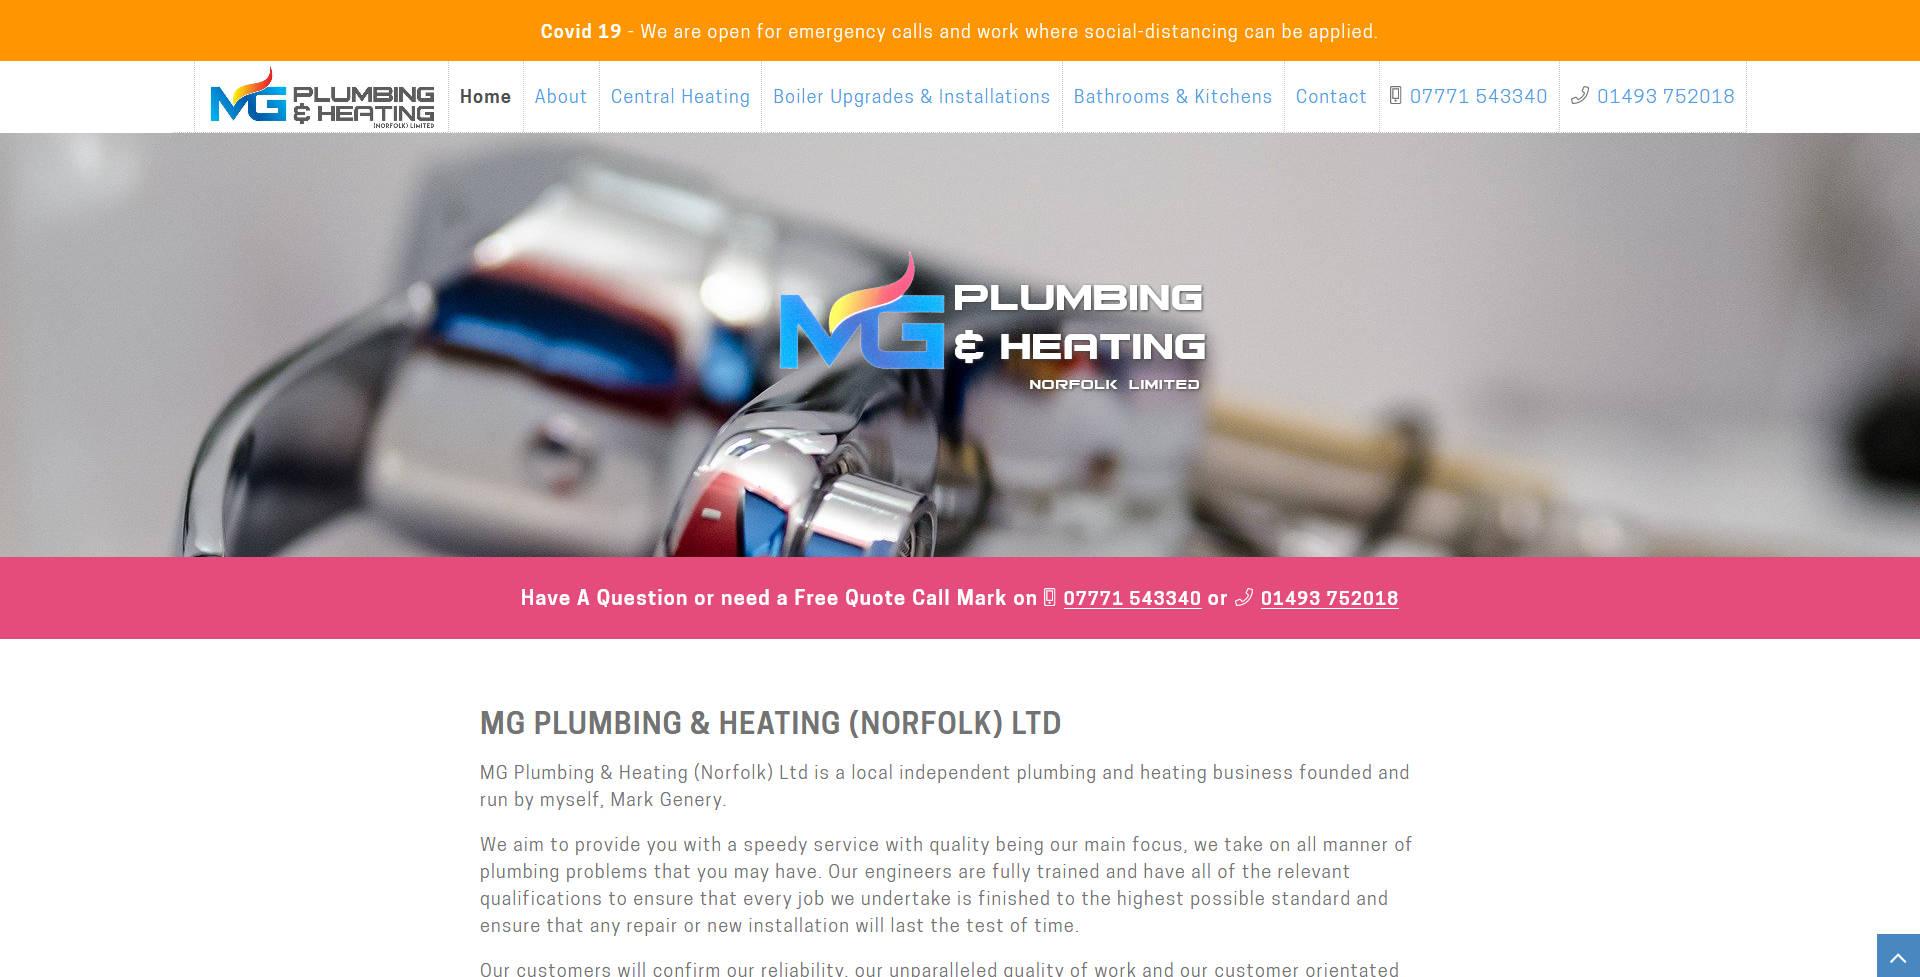 MG Plumbing & Heating (Norfolk) Ltd